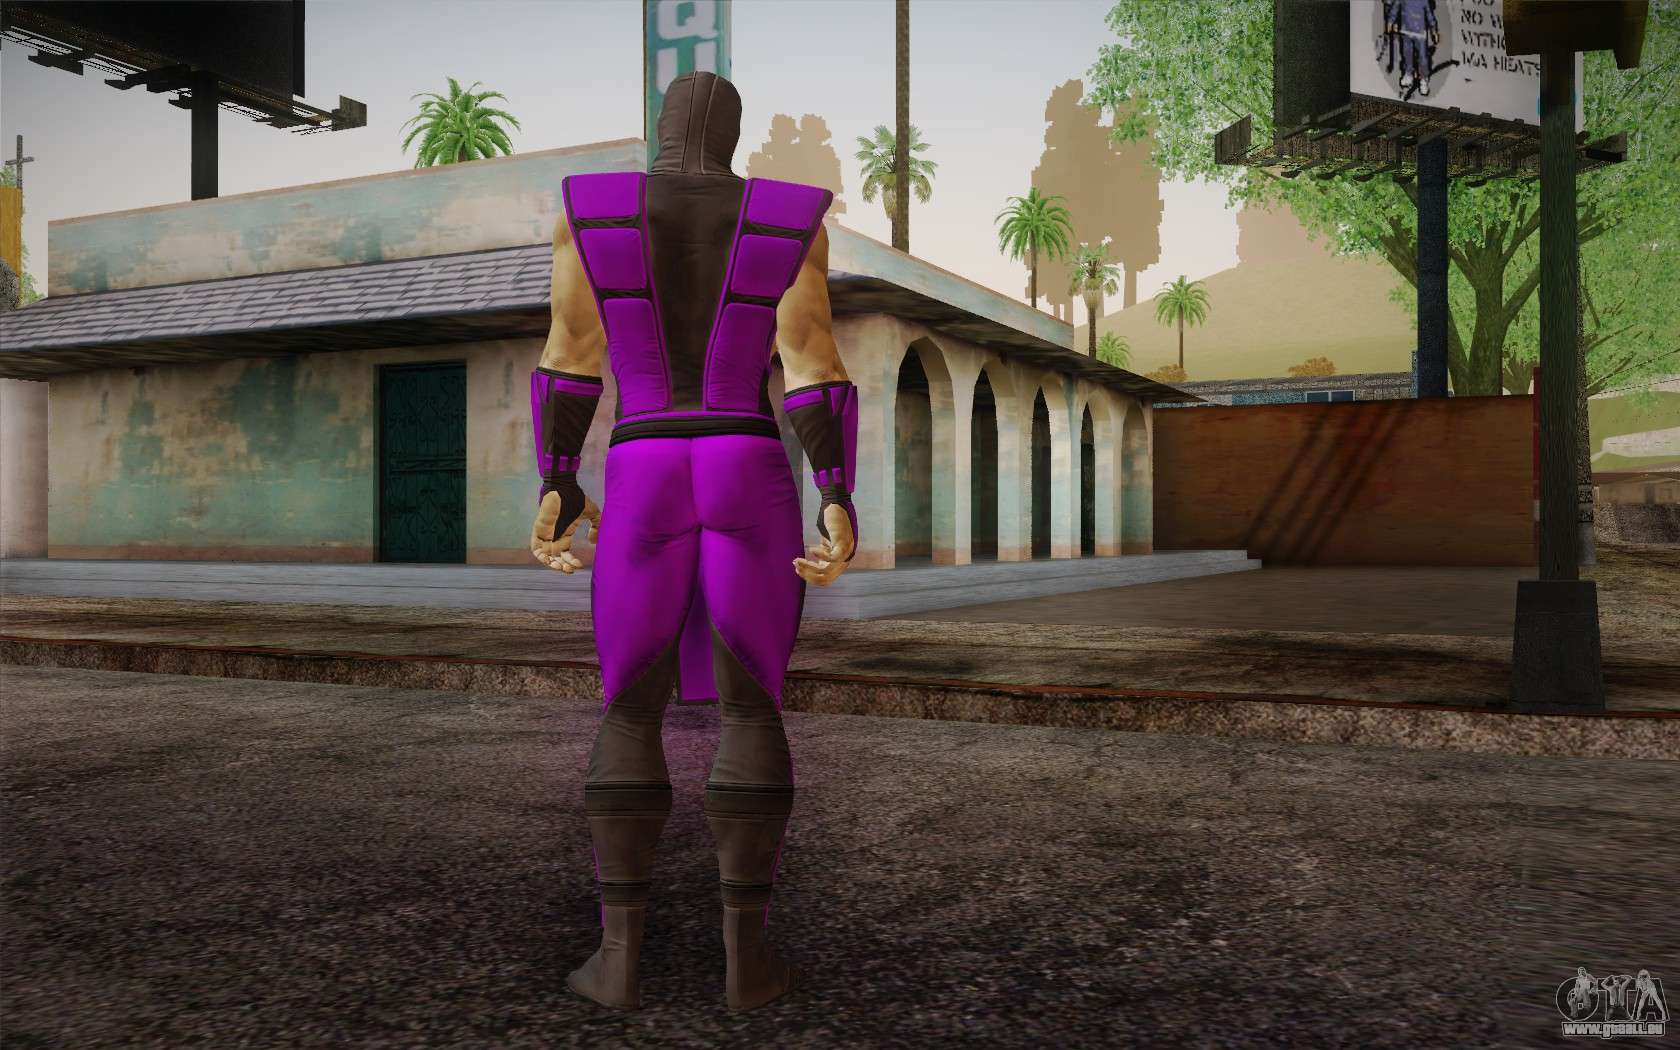 San andreas sexe mini jeu vidéo